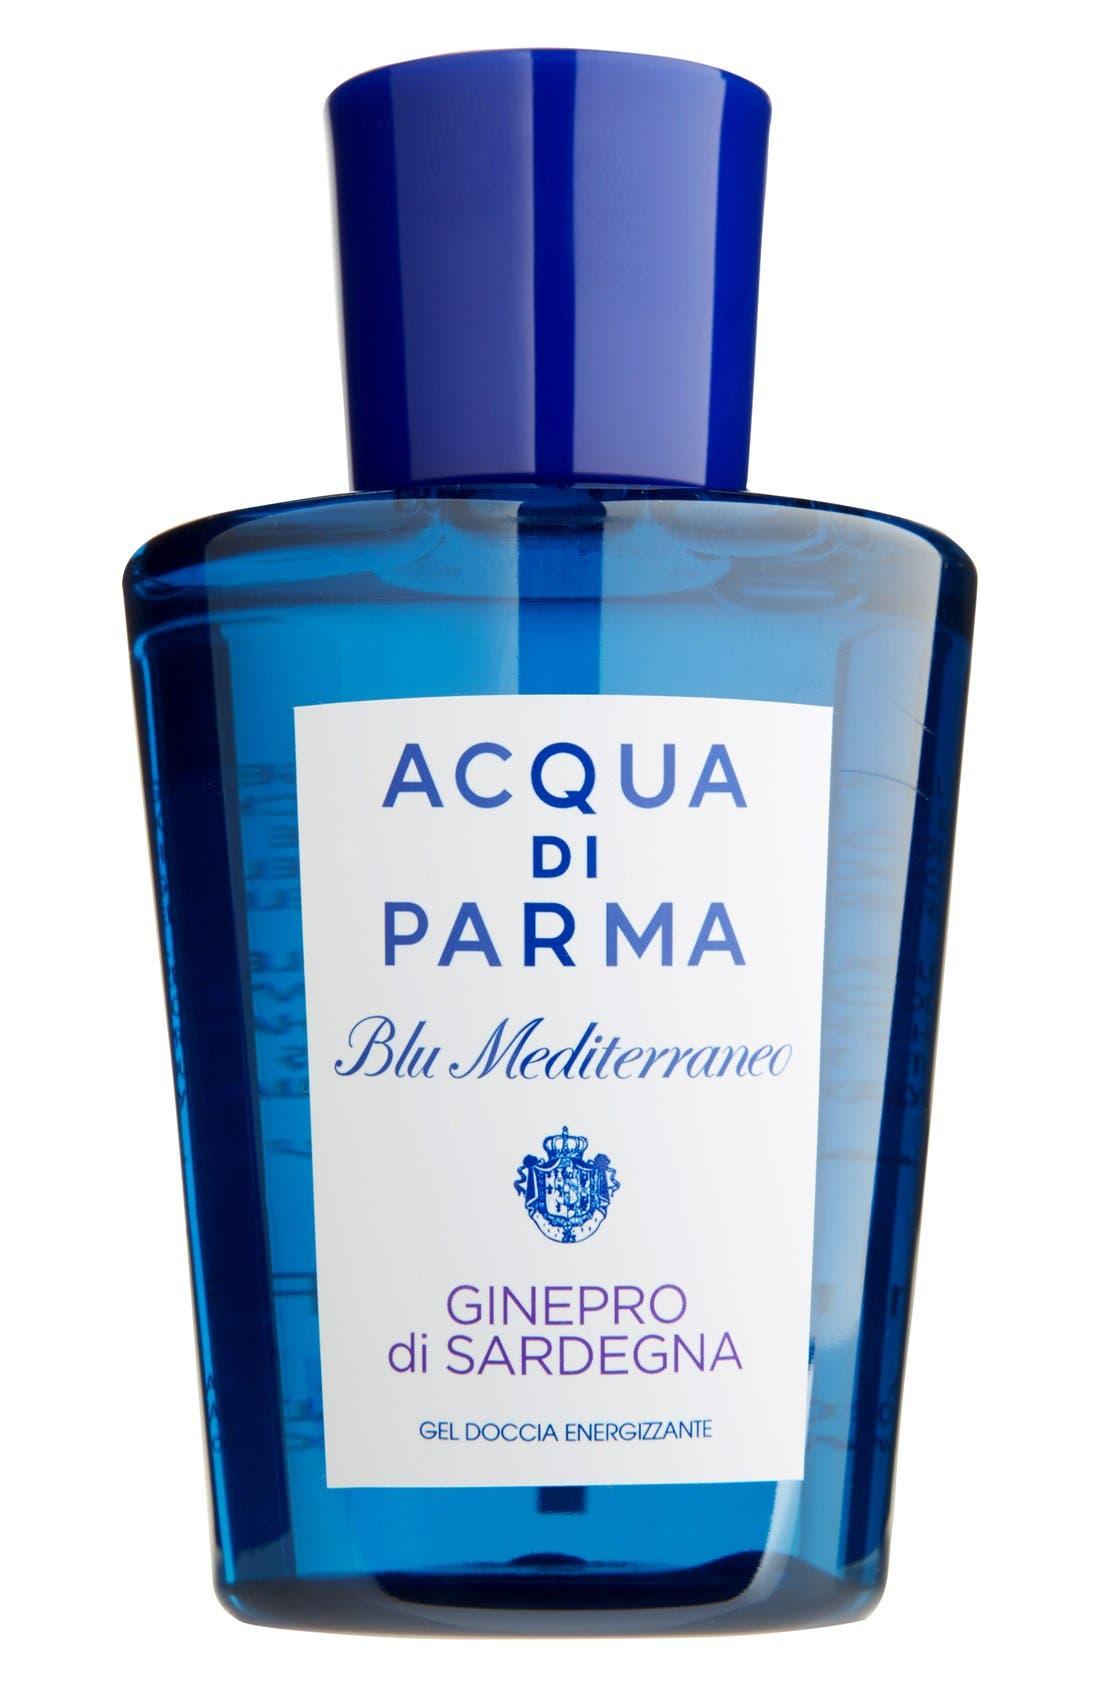 'Blu Mediterraneo - Ginepro di Sardegna' Energizing Shower Gel,                             Main thumbnail 1, color,                             NO COLOR